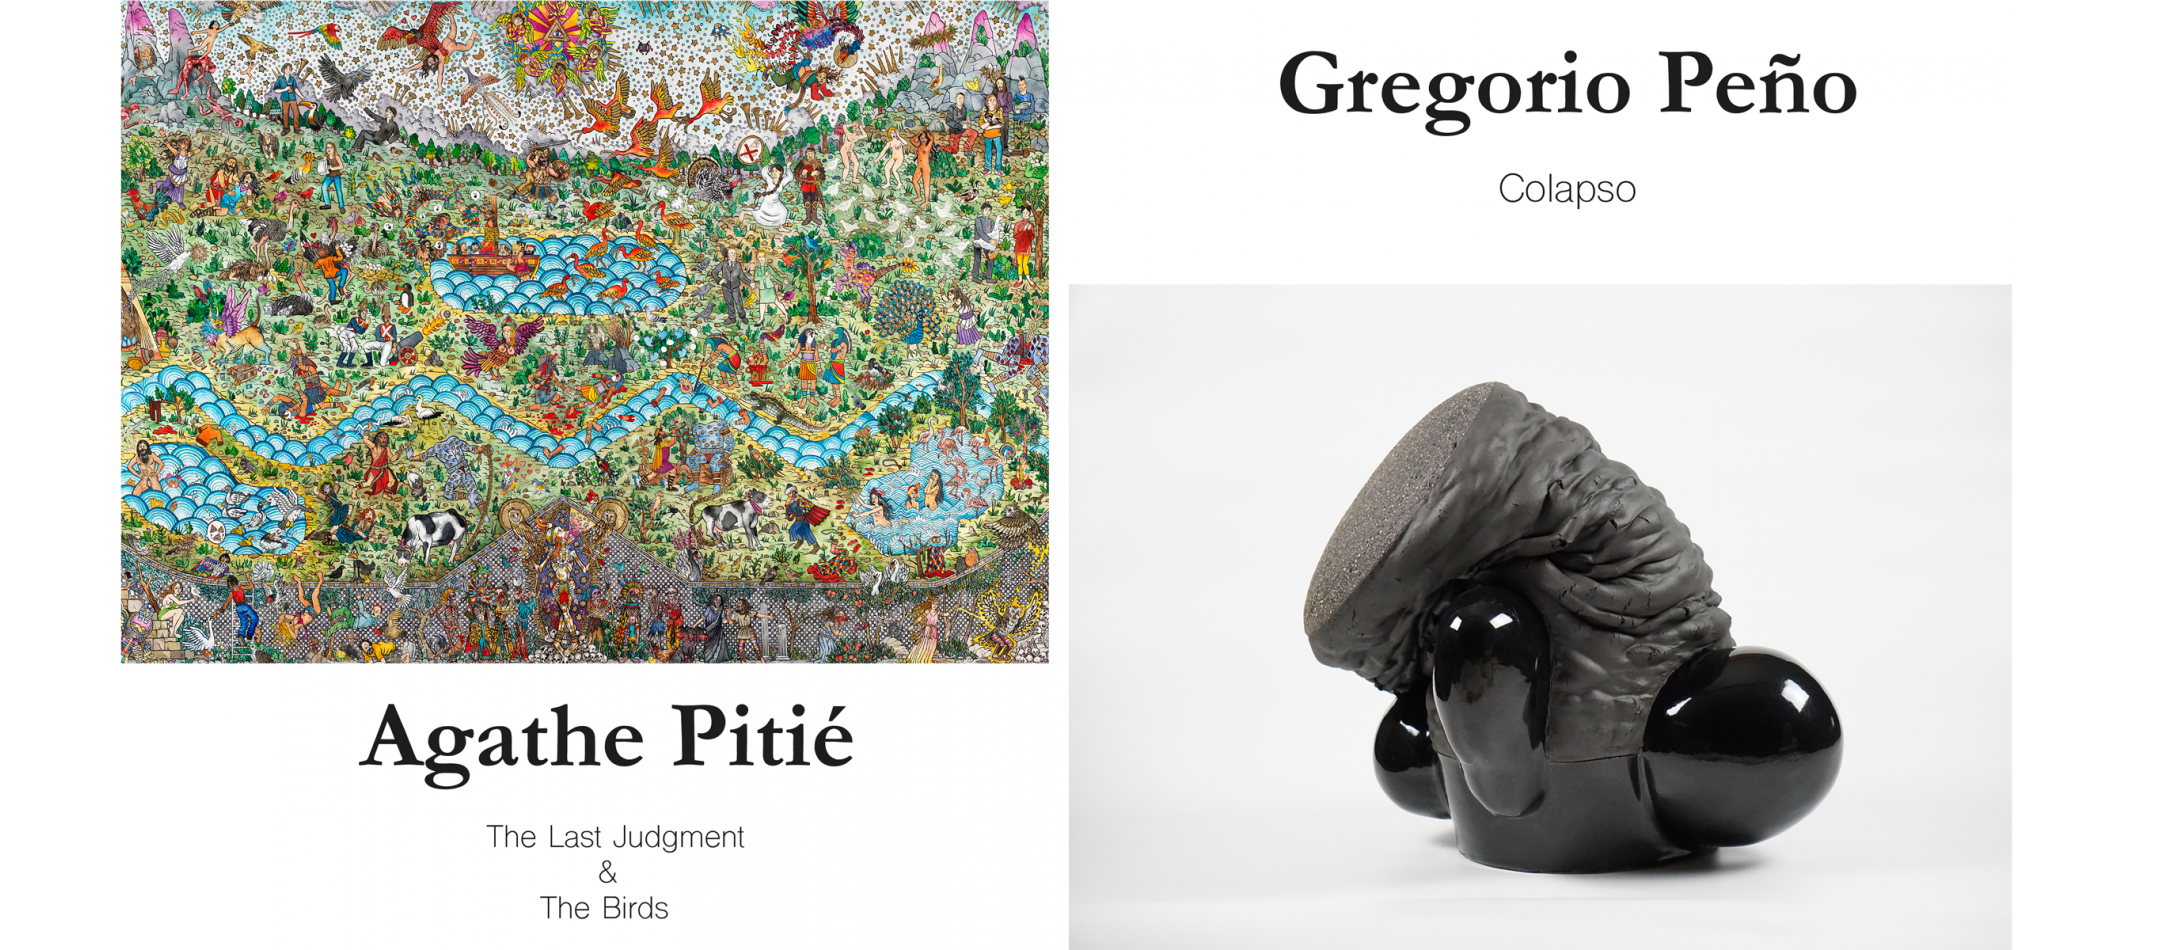 Agathe Pitié & Gregorio Peño